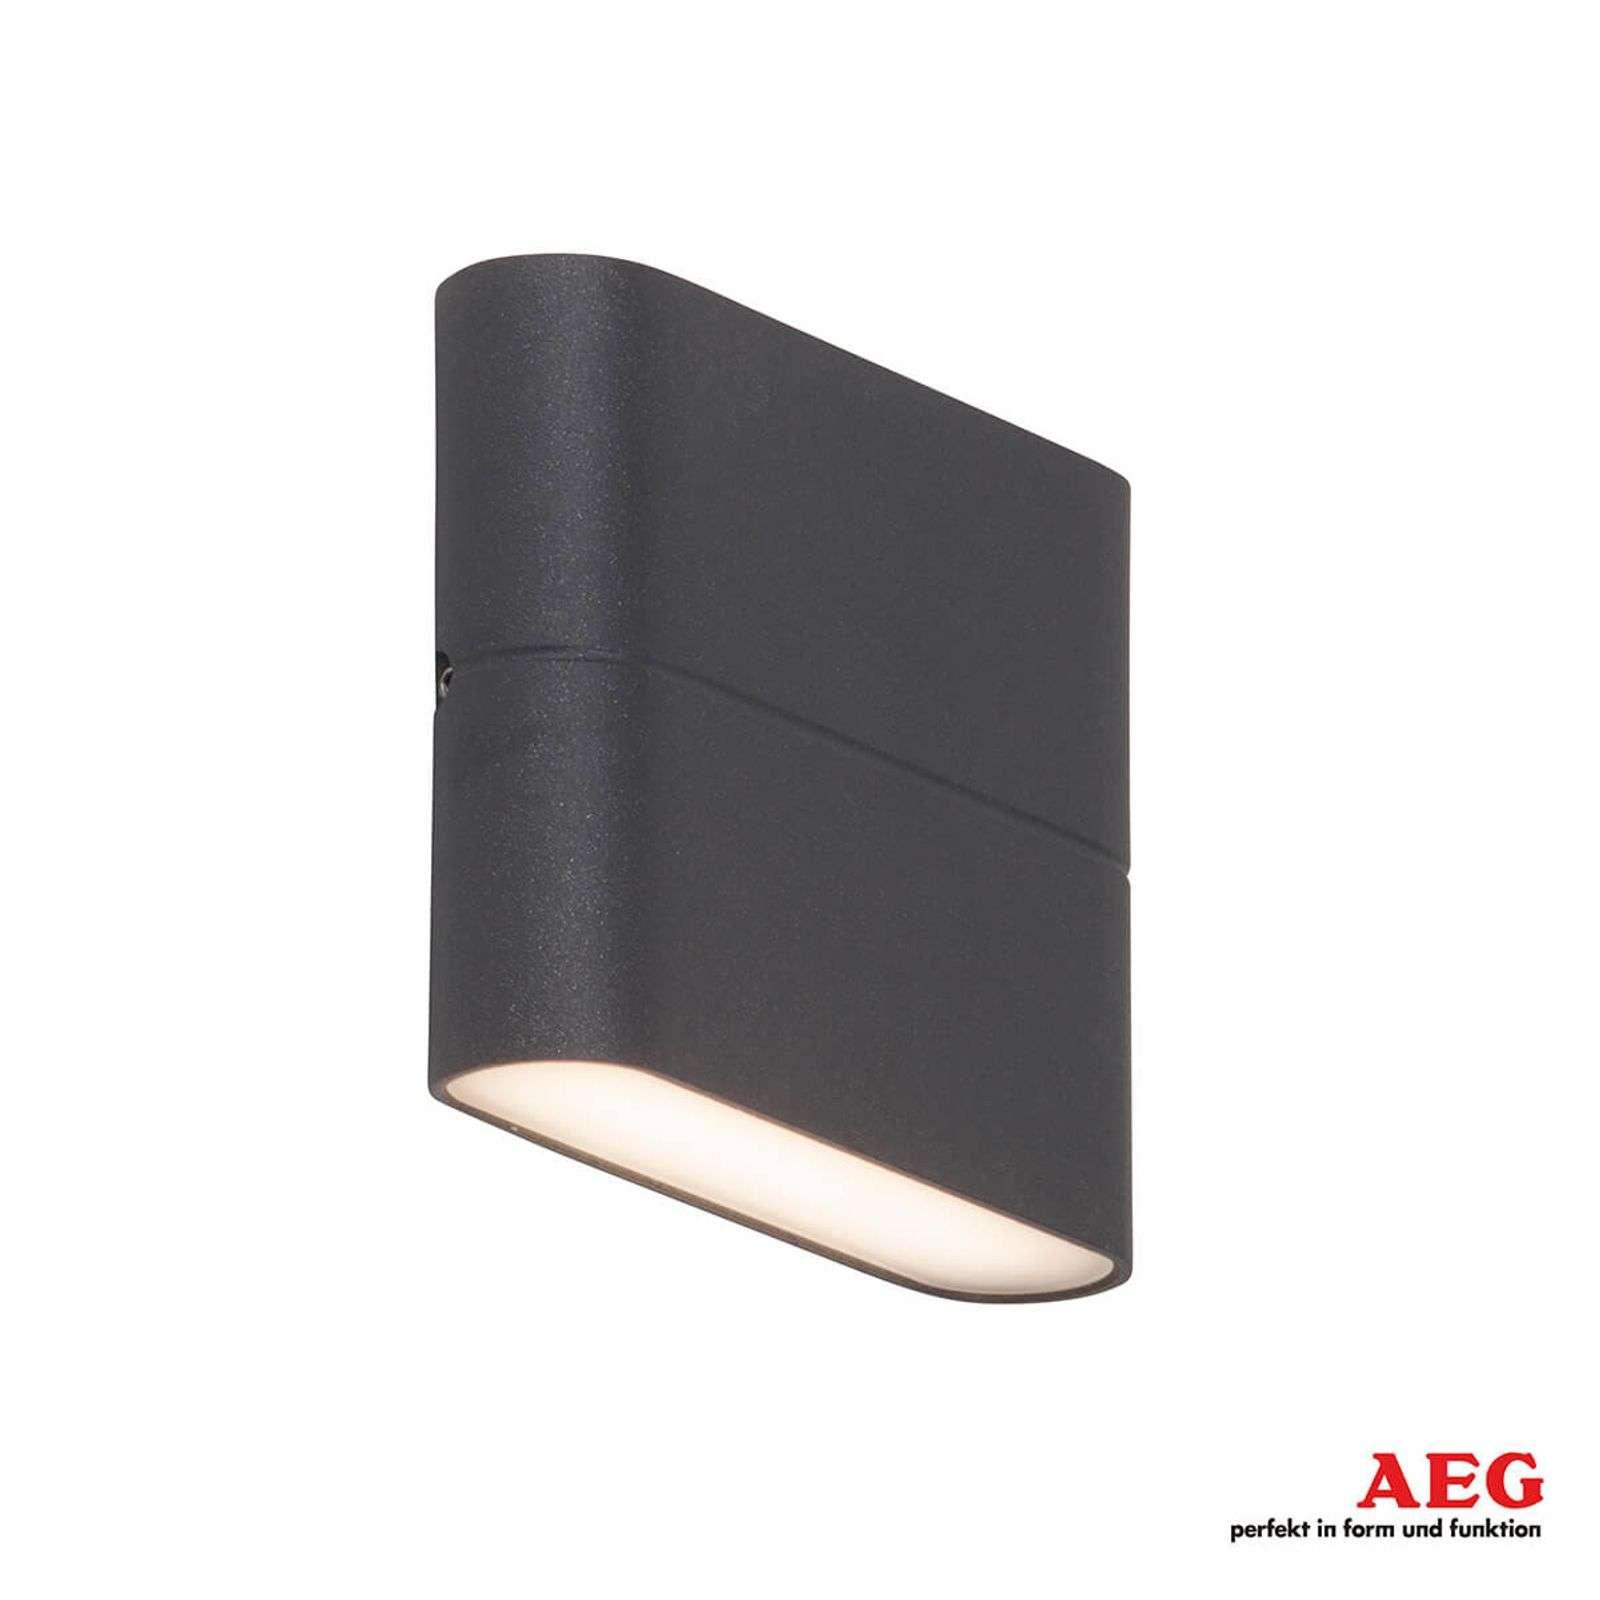 AEG Luce a parete LED per esterni Telesto 11,5cm